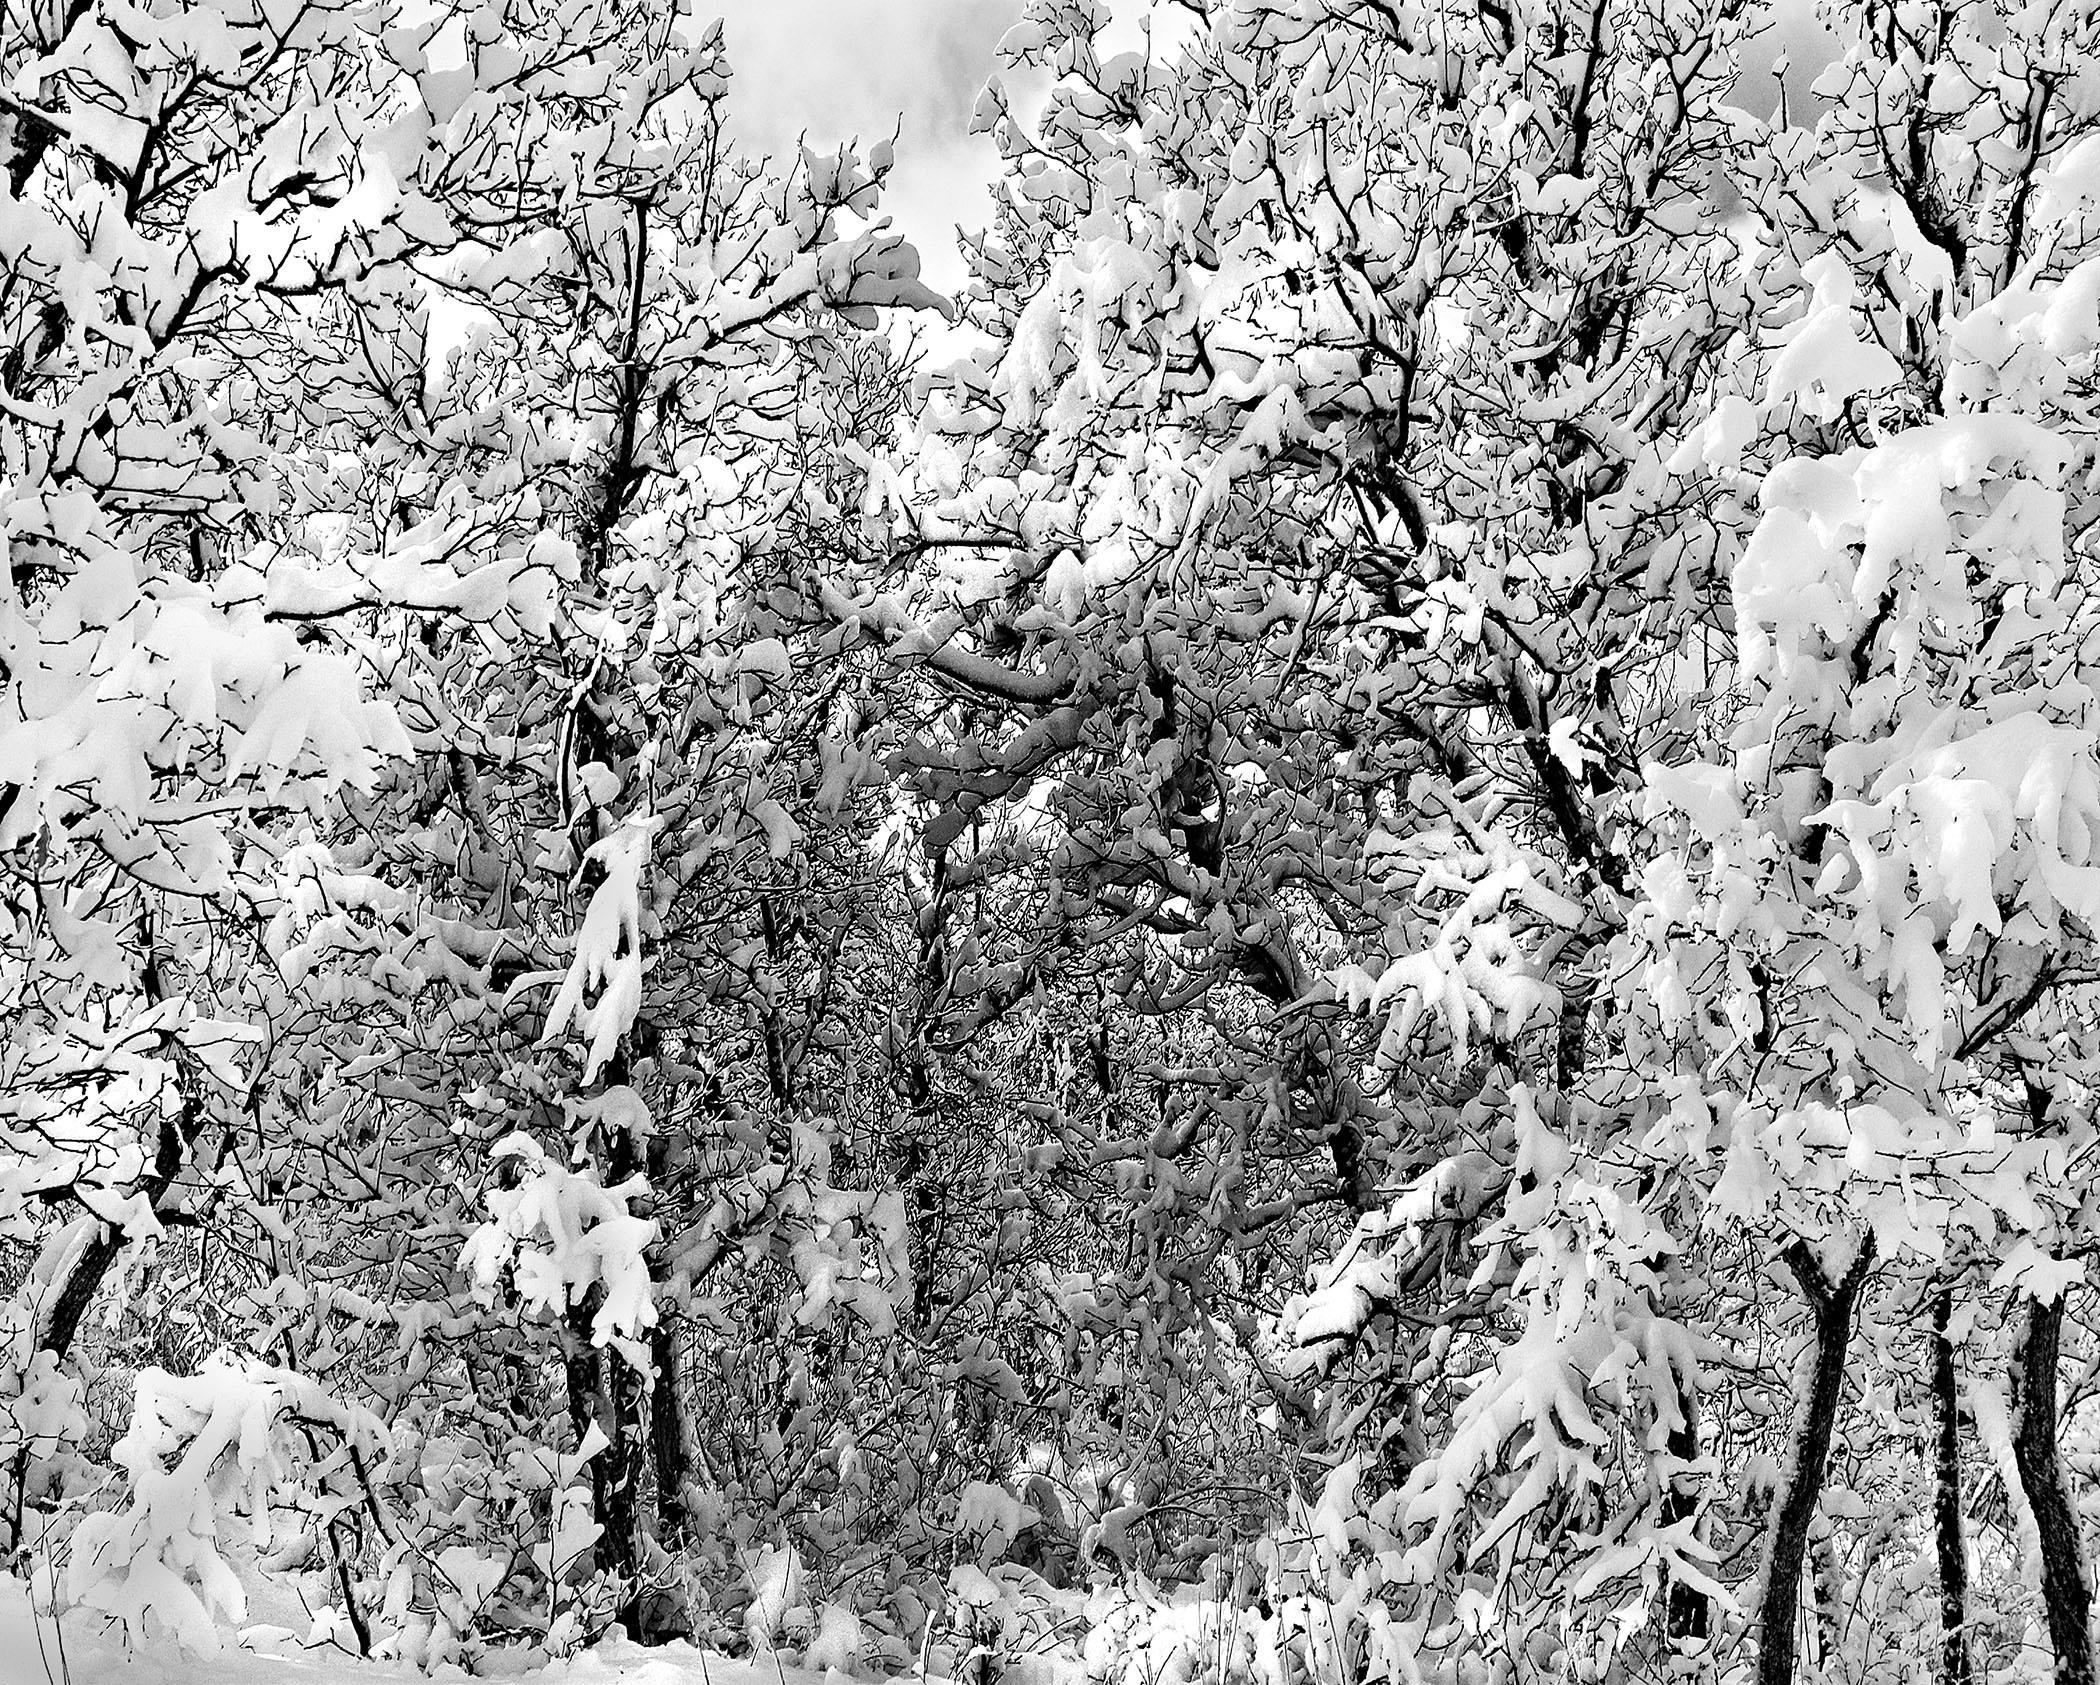 Michael Fain - Winter Trees 17 1/6